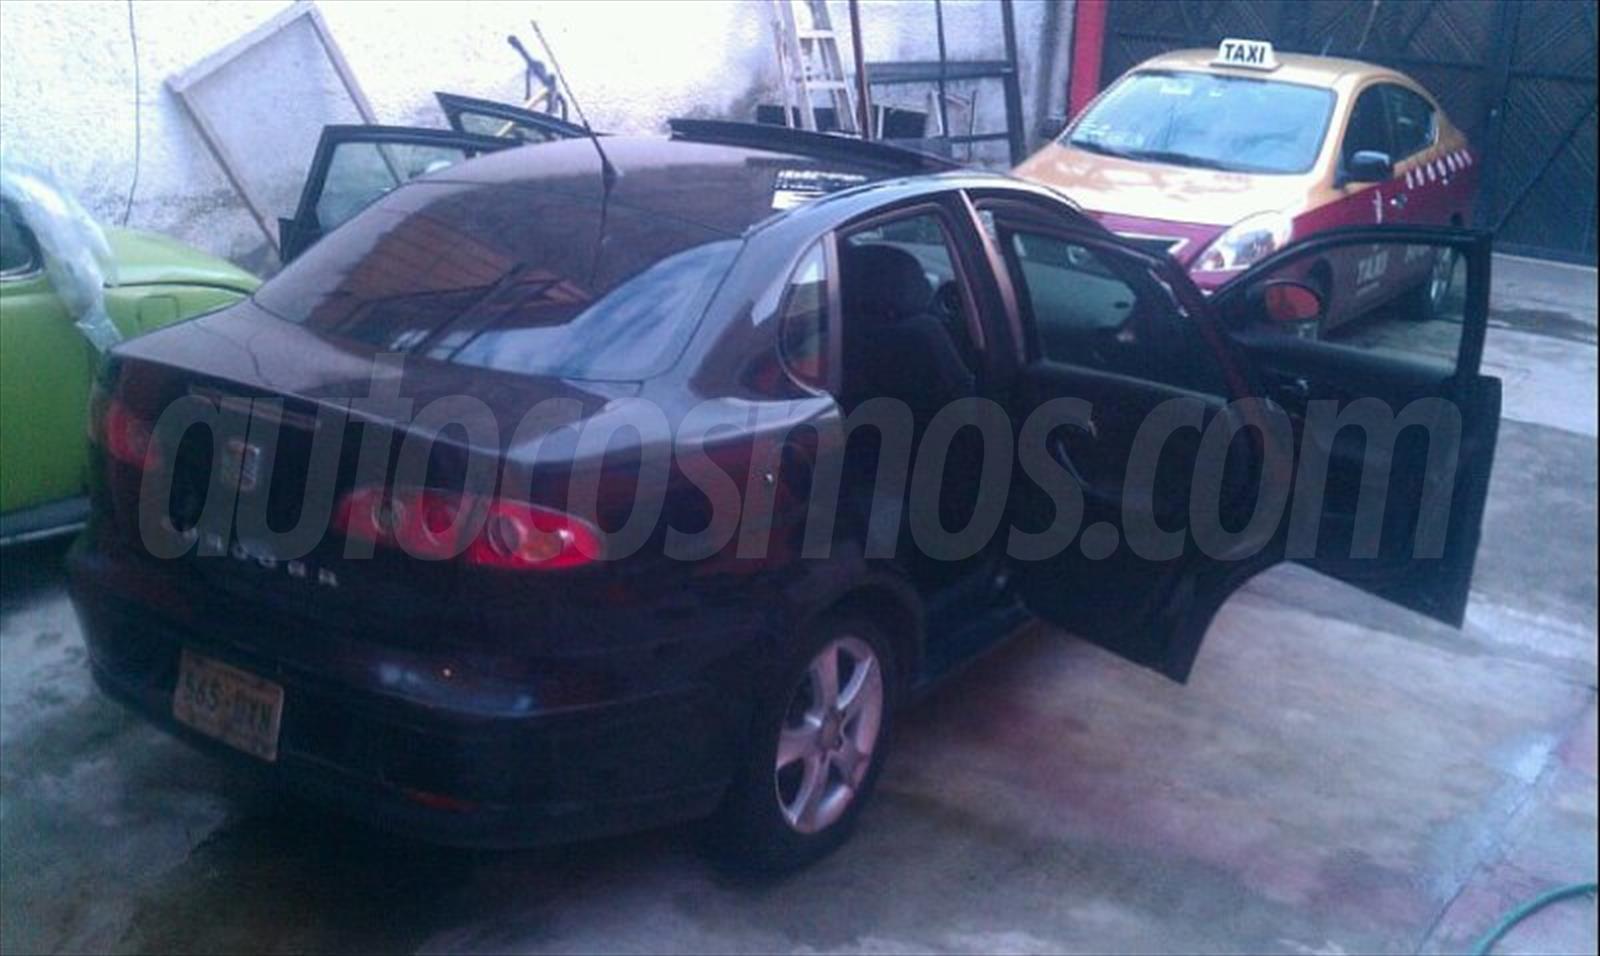 Venta Autos Usado Distrito Federal Seat Cordoba Sport